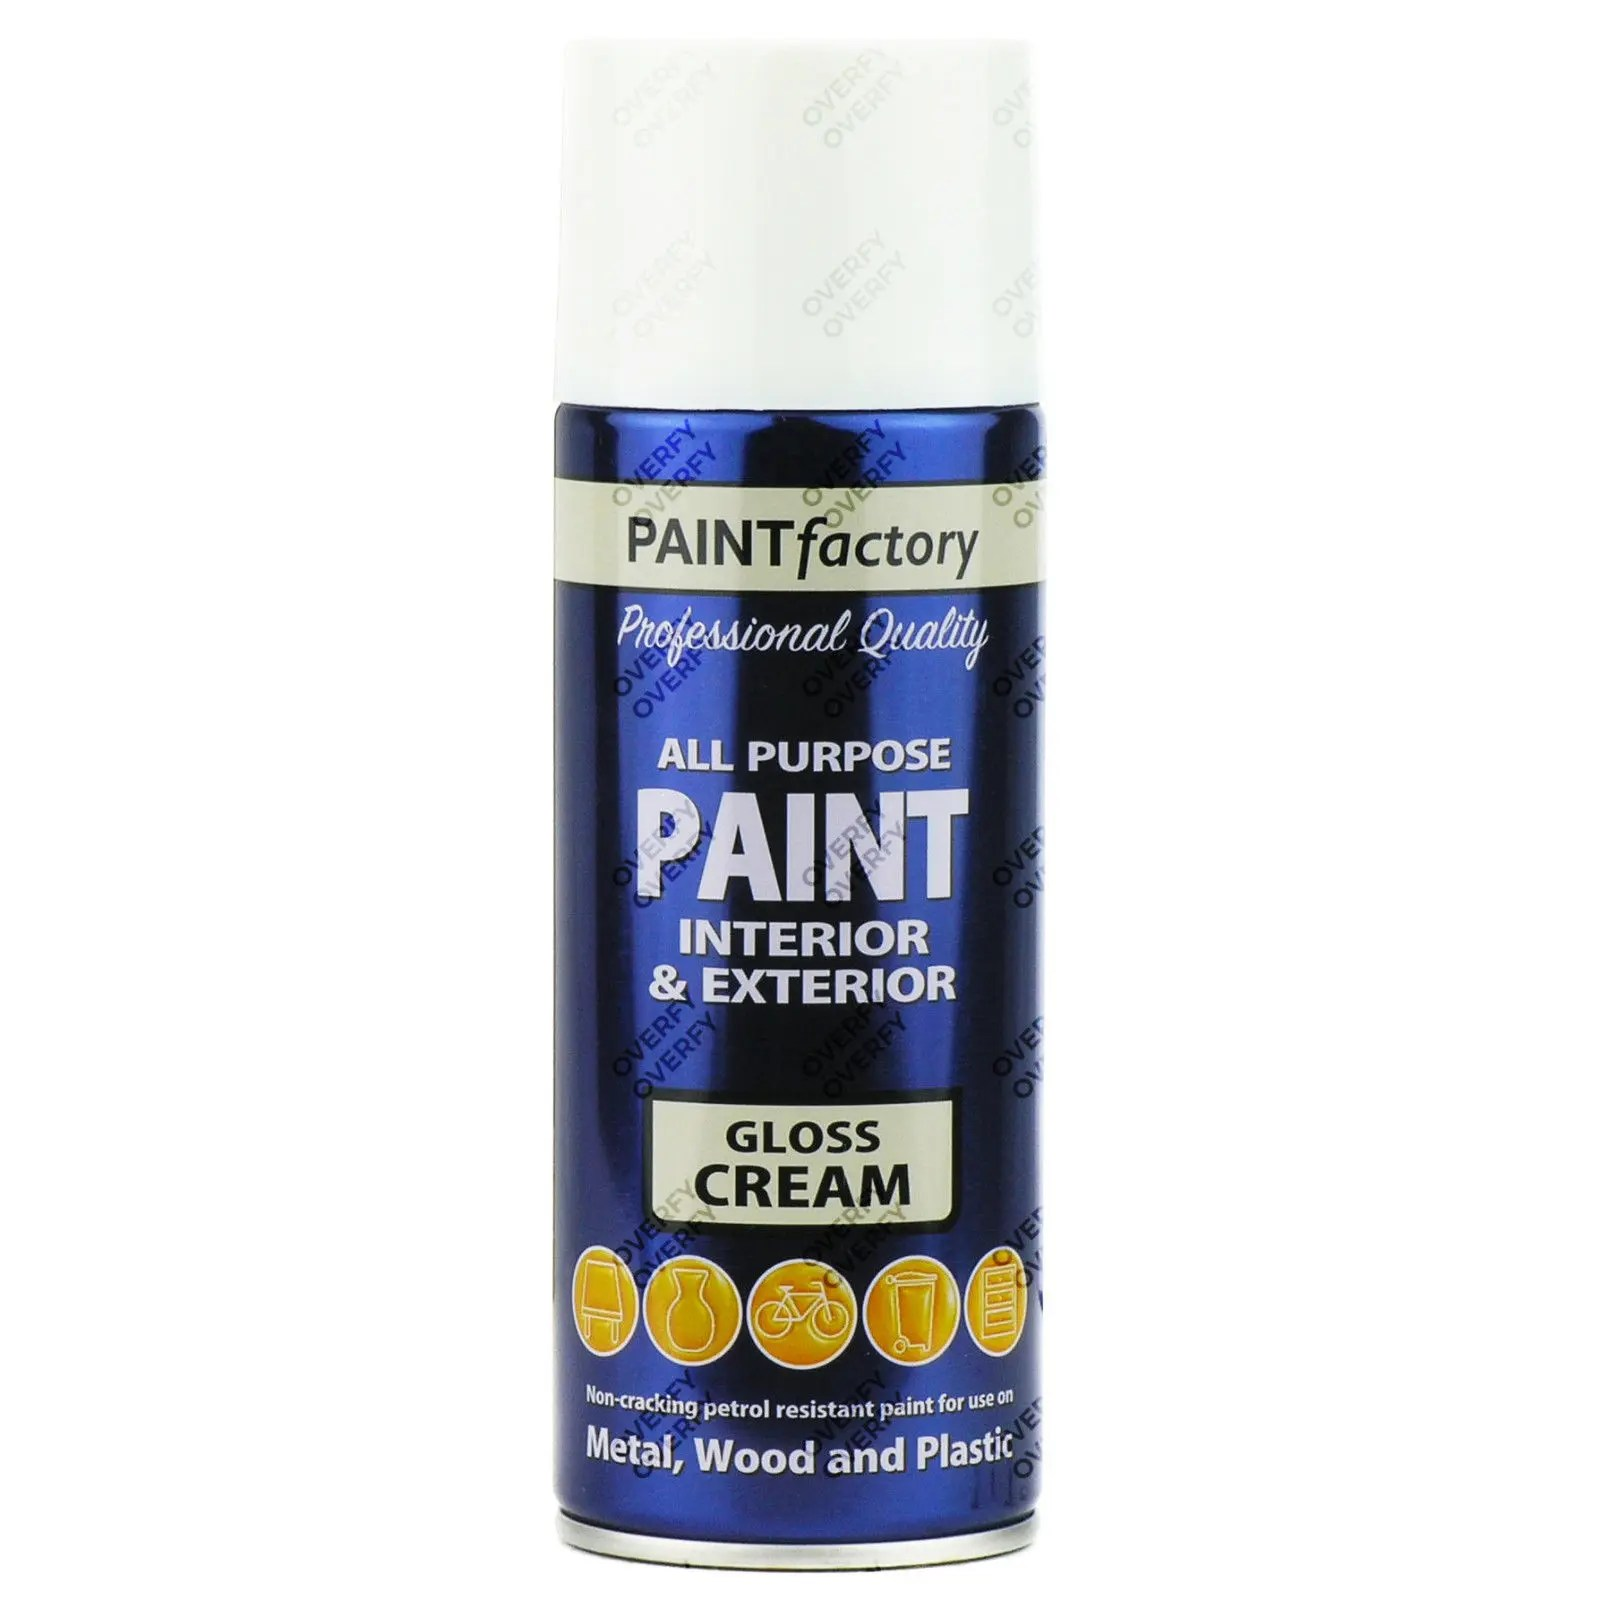 1-x-400ml-All-Purpose-Cream-Gloss-Aerosol-Spray-Paint-Household-Car-Plastic-371708424085